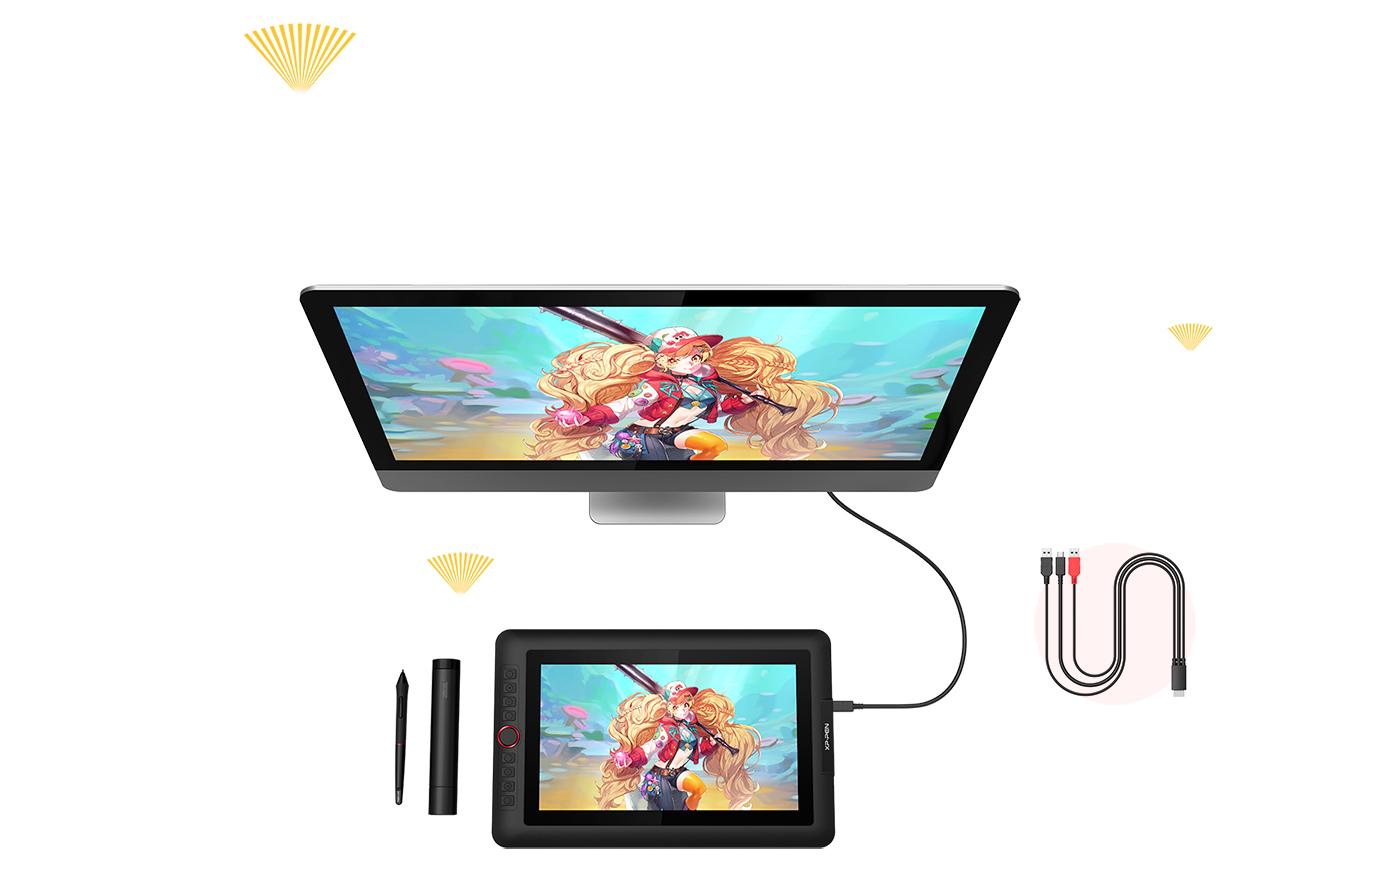 XP-Pen Artist 13.3 Pro Tableta gráfica con pantalla portátil 13.3 pulgadas